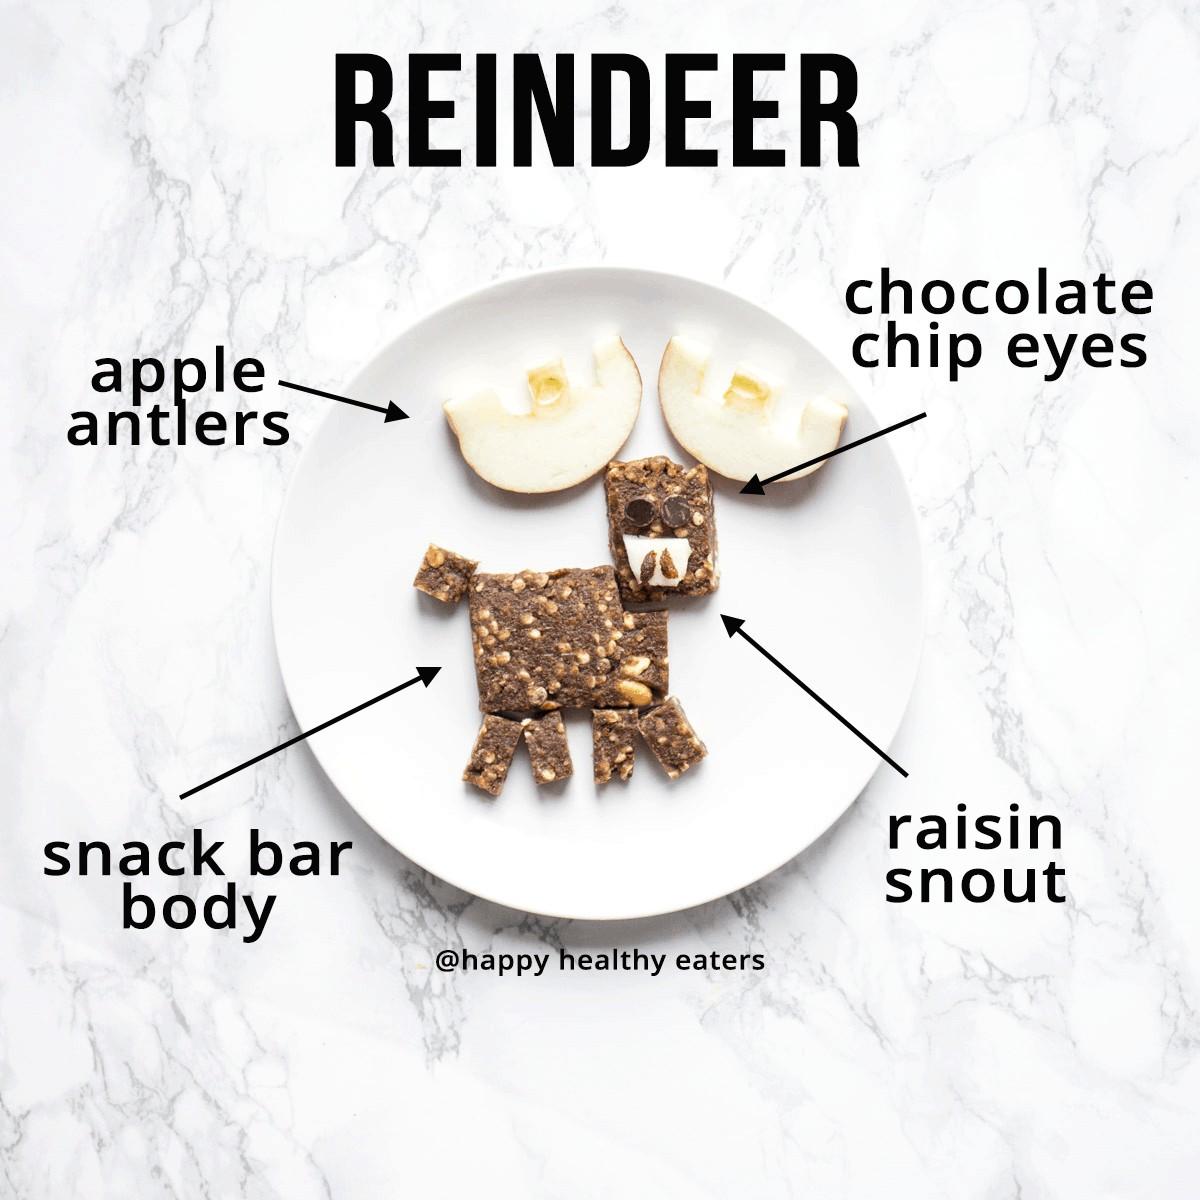 Christmas Snacks: easy and healthy (reindeer)